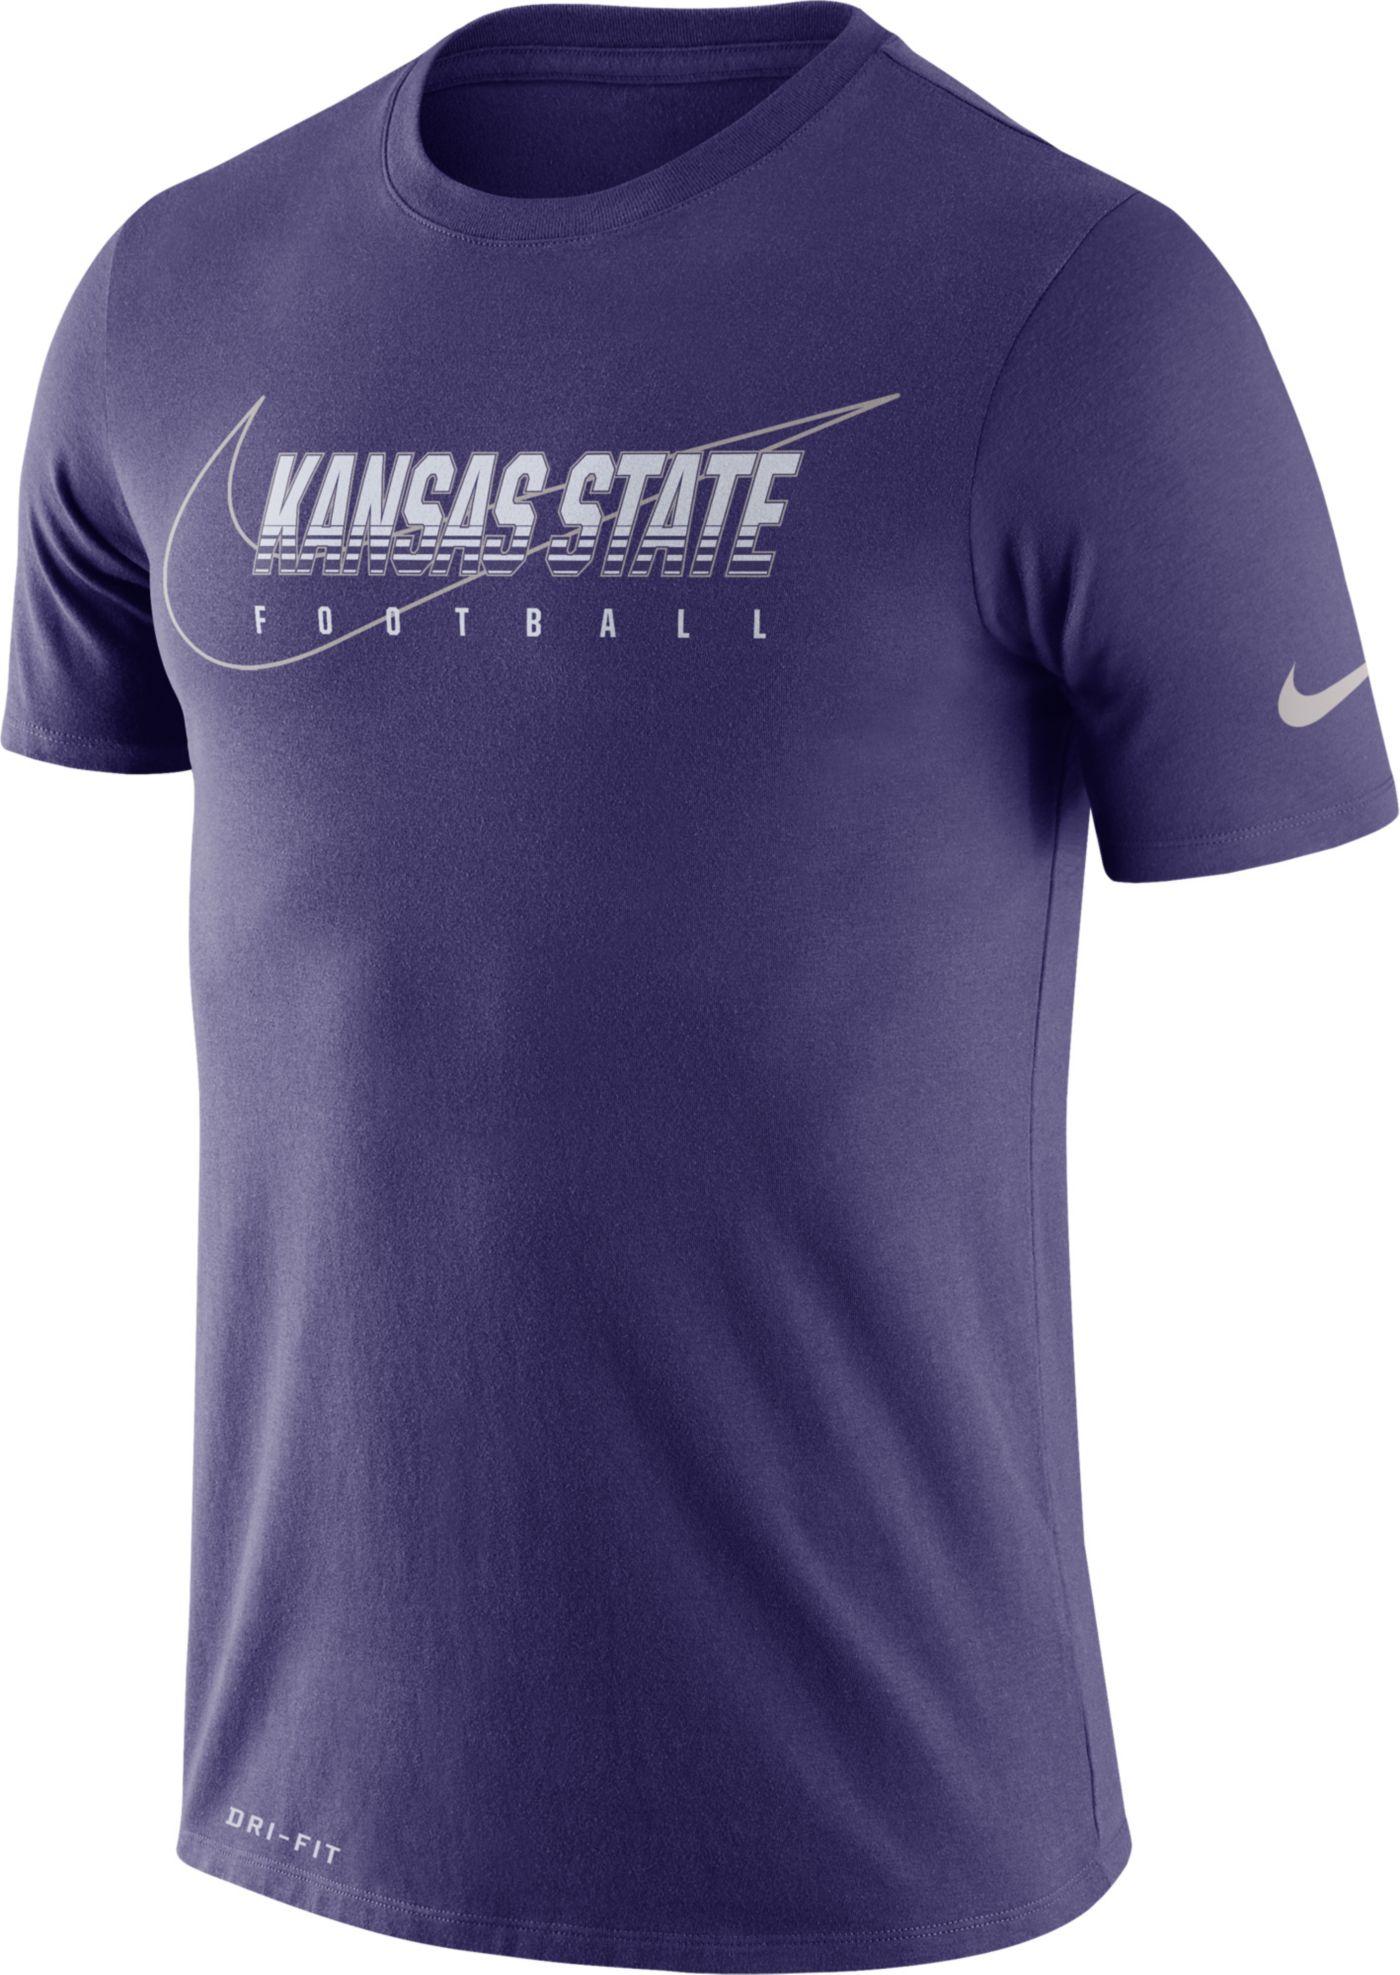 Nike Men's Kansas State Wildcats Purple Football Dri-FIT Cotton Facility T-Shirt